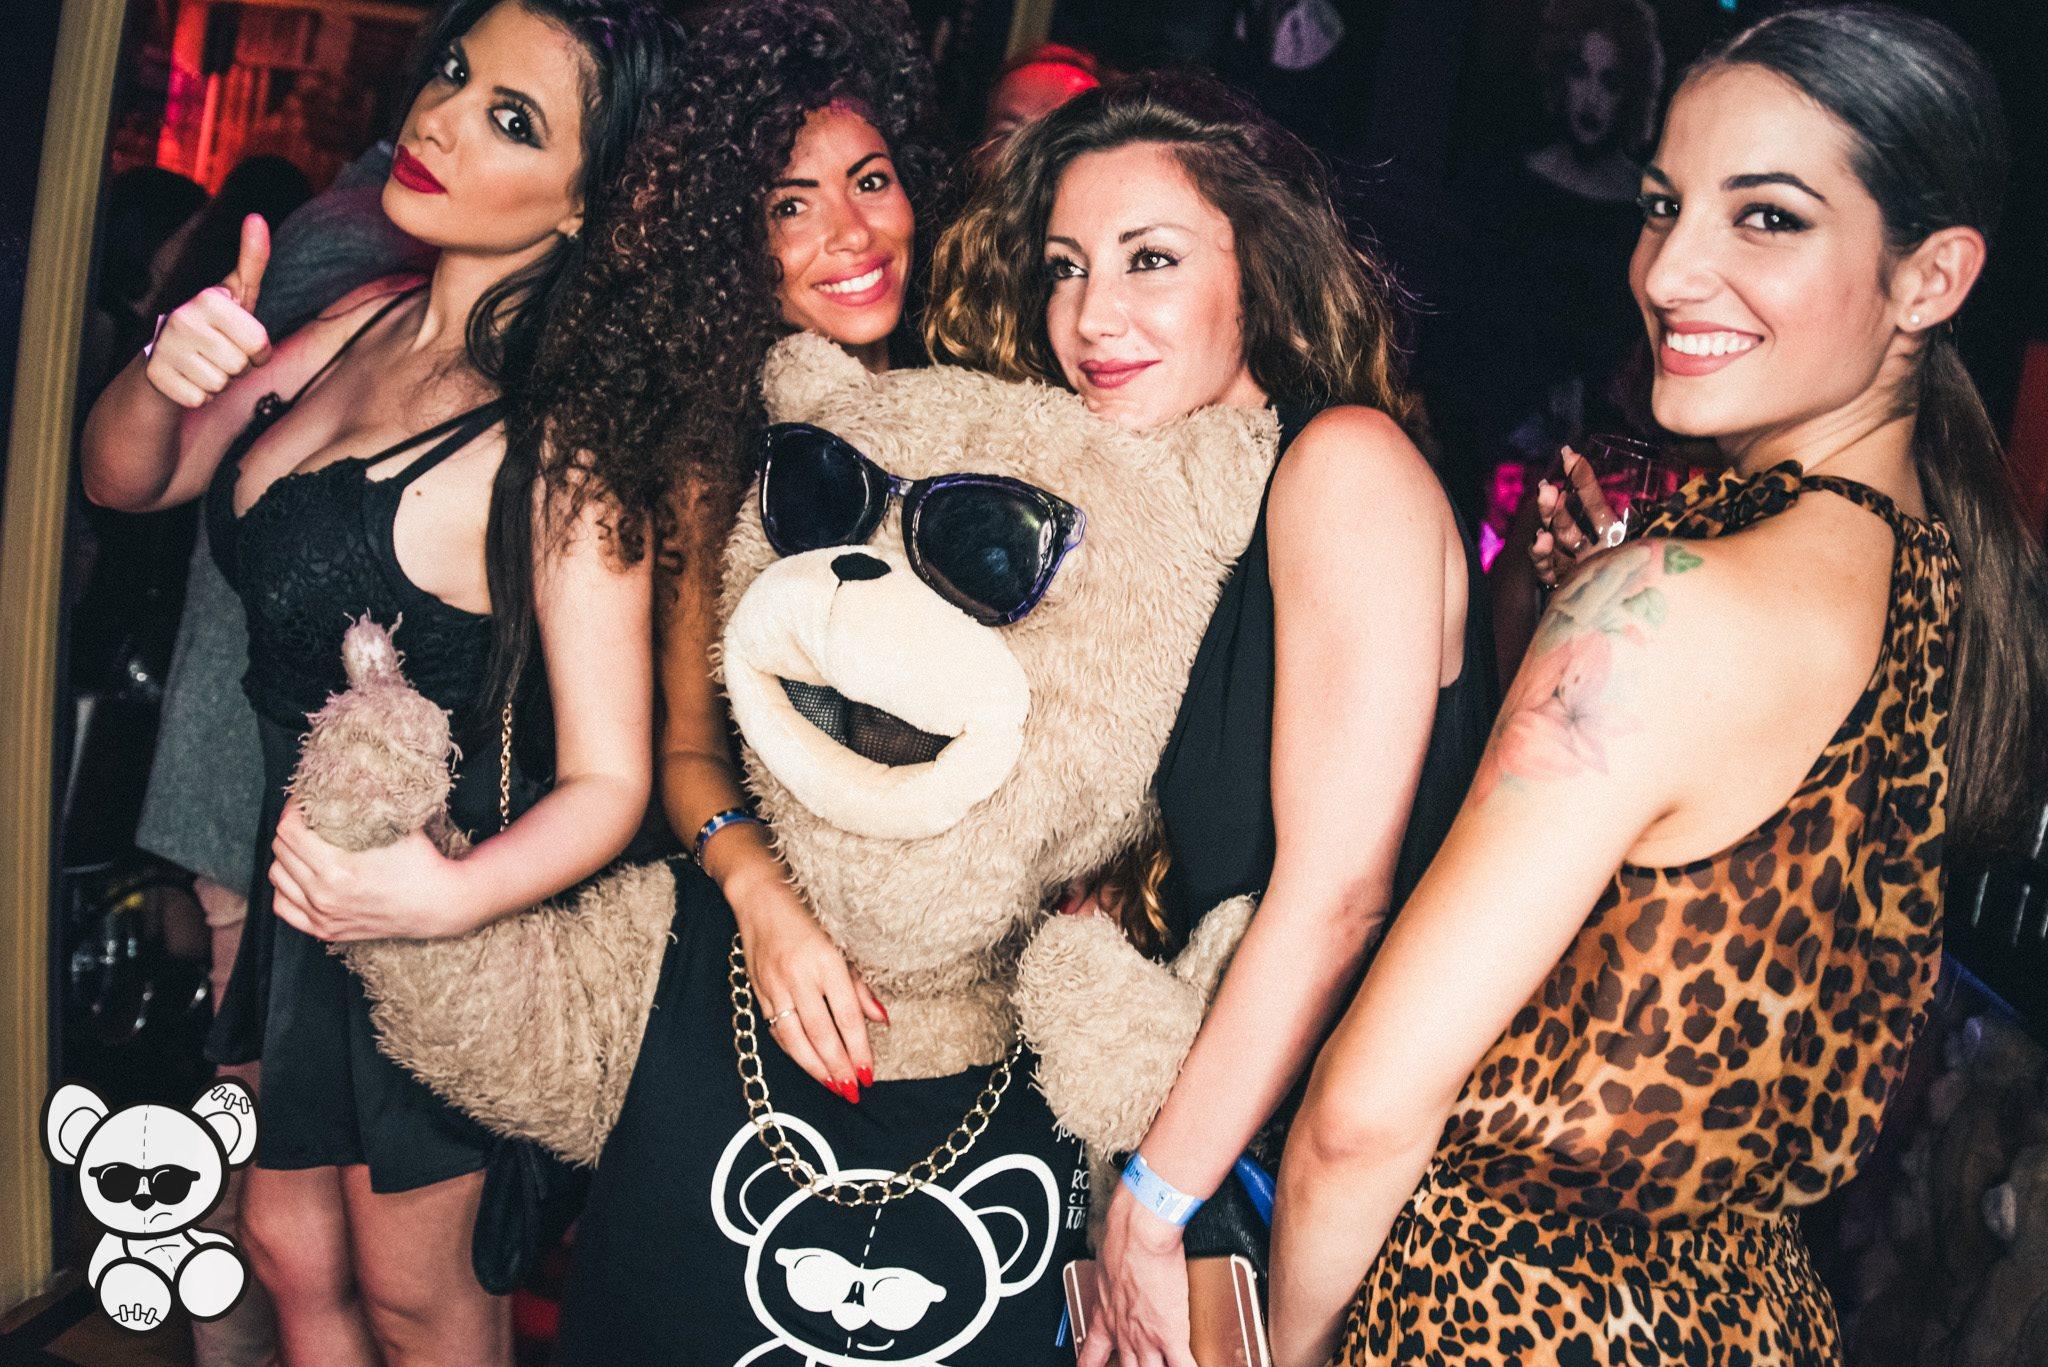 Top 4 Disco Clubs In Rome